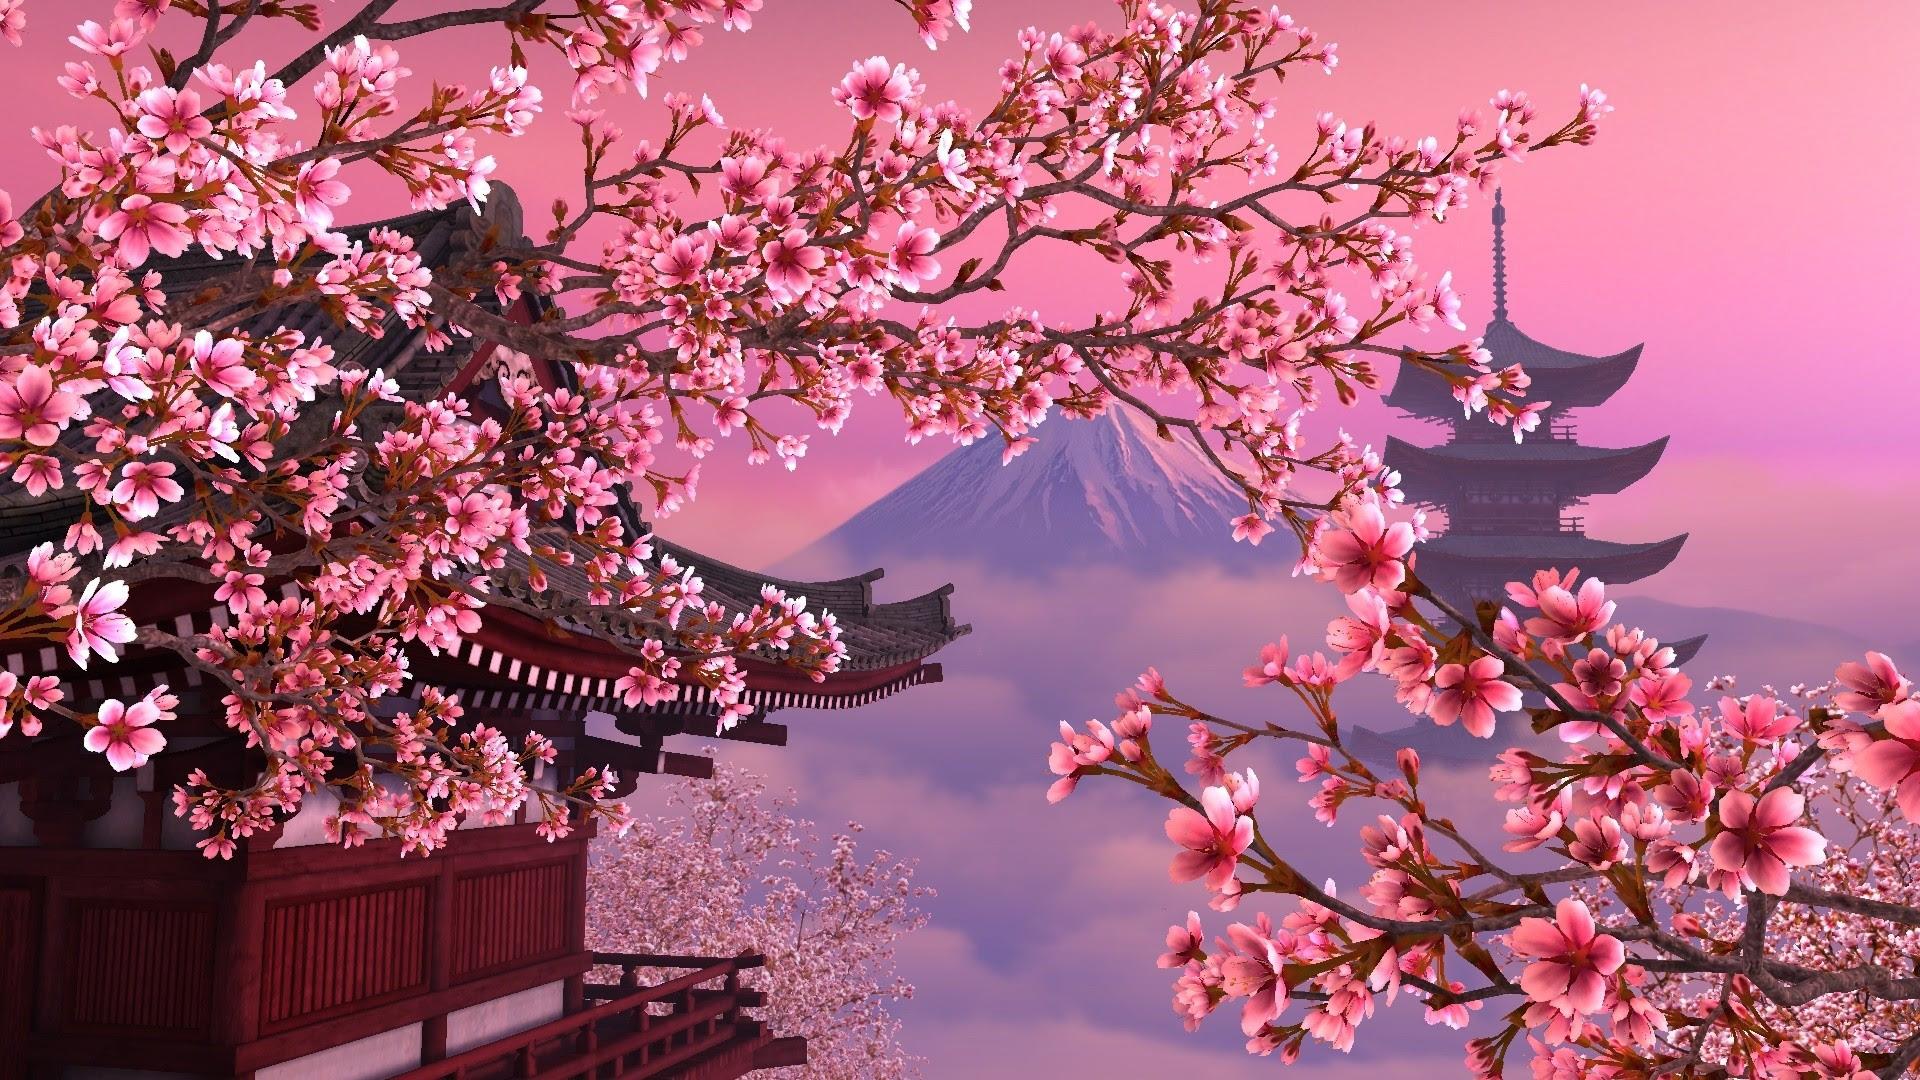 Japanese Cherry Blossom Wallpaper 1920x1080 59 Images